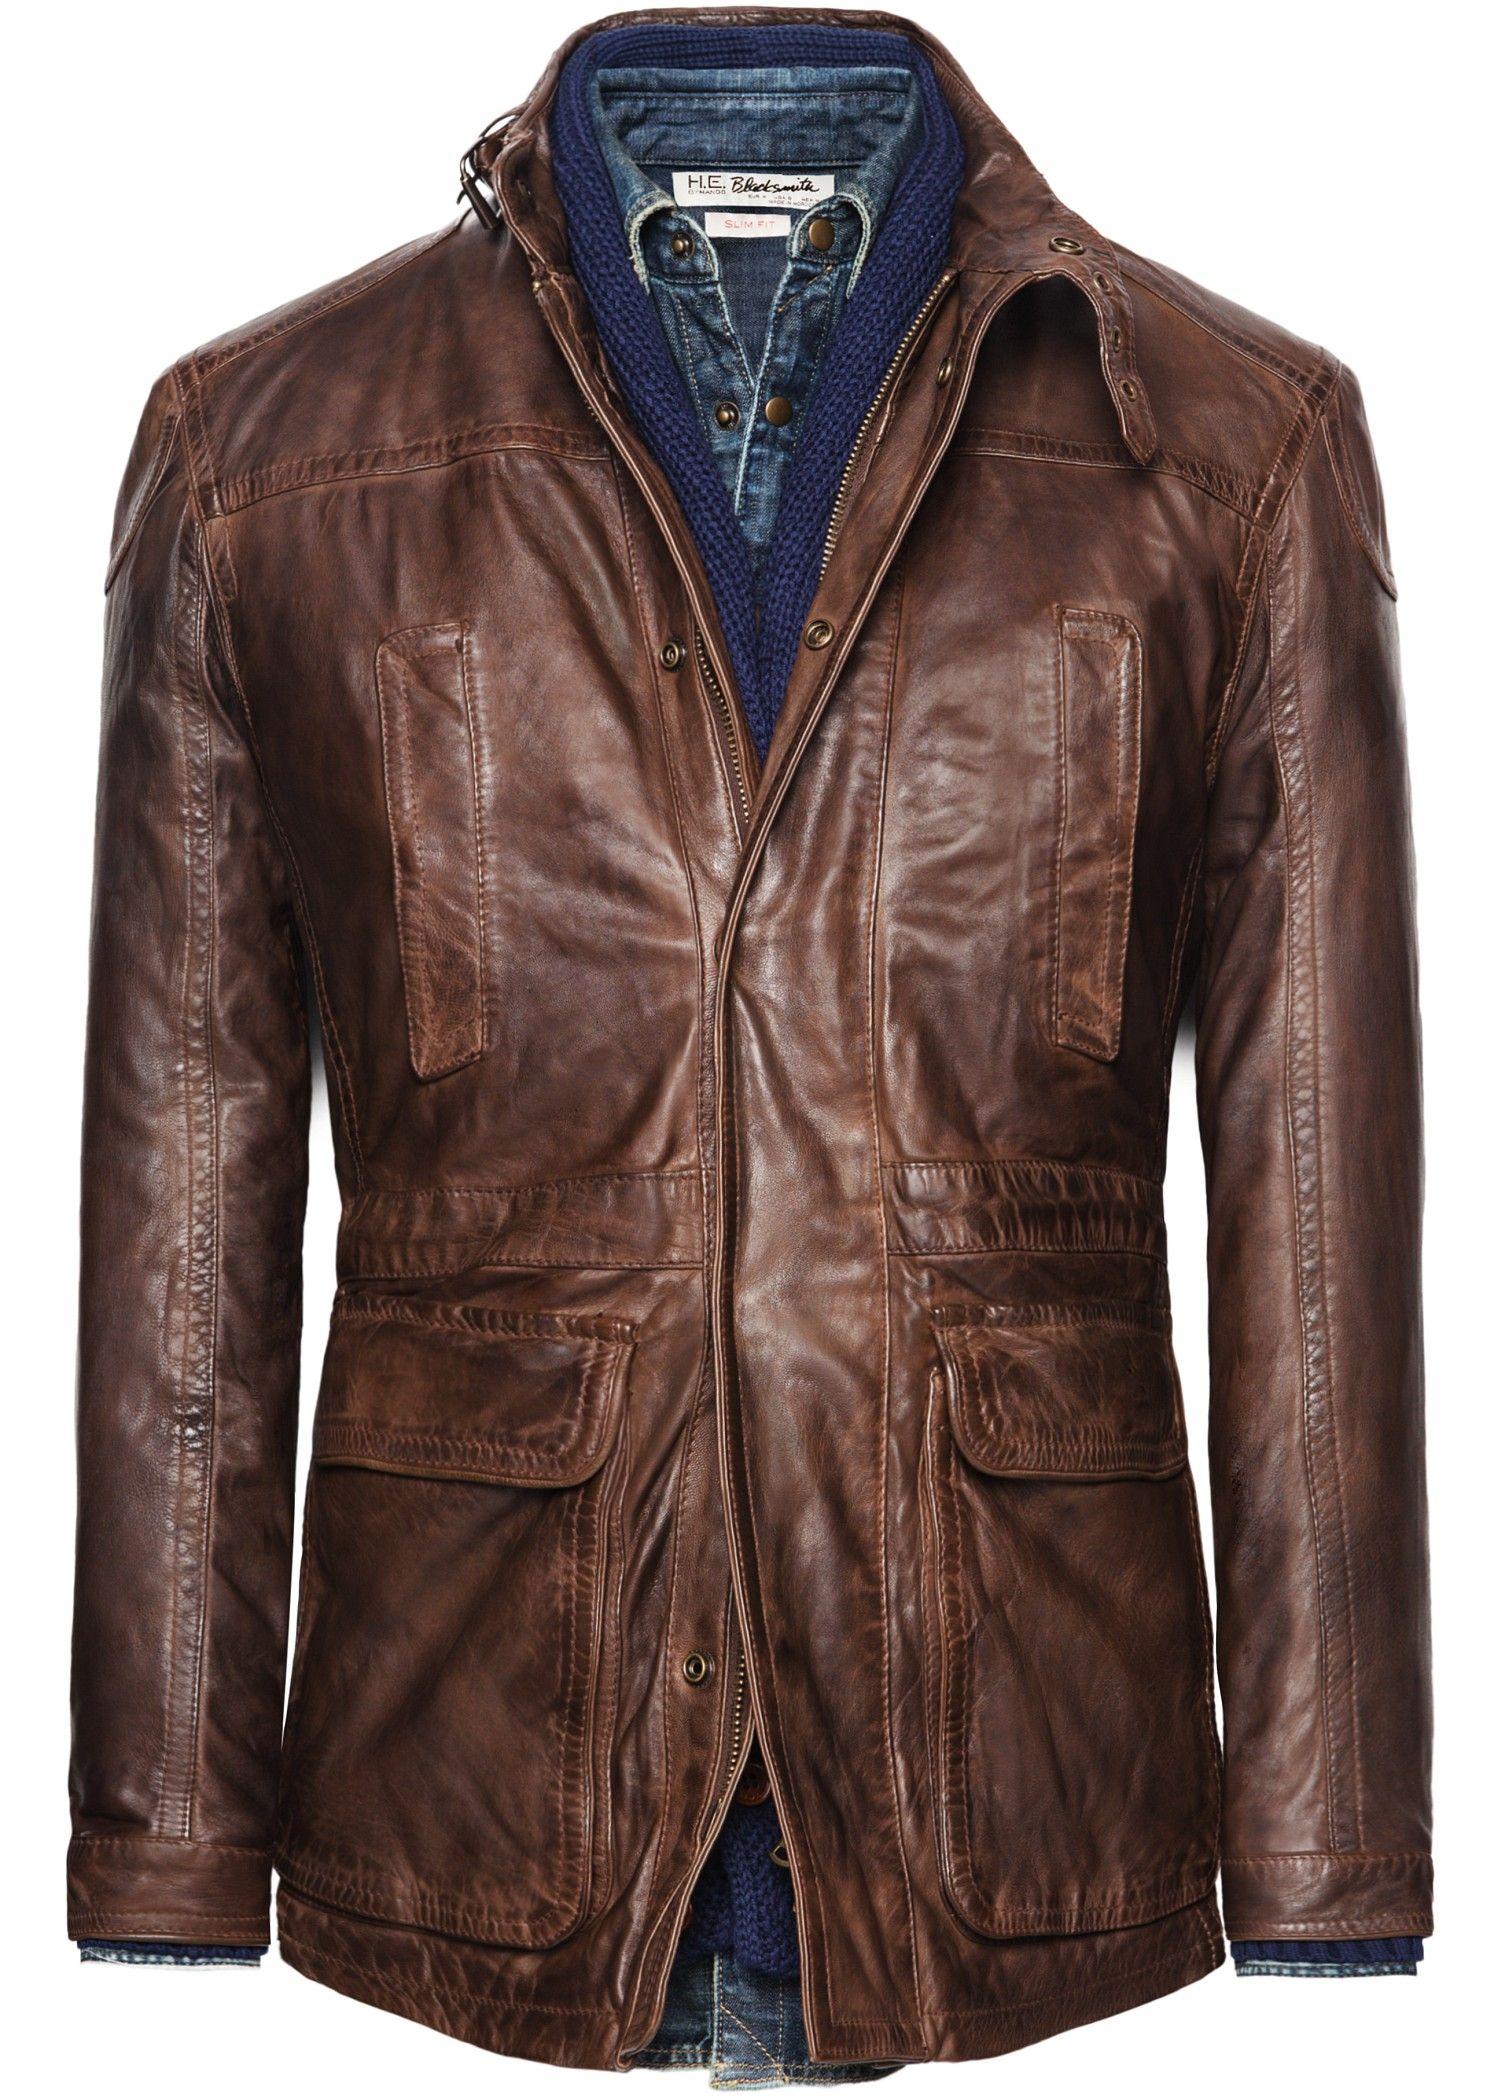 Leather field jacket Leather jacket, Leather jacket men